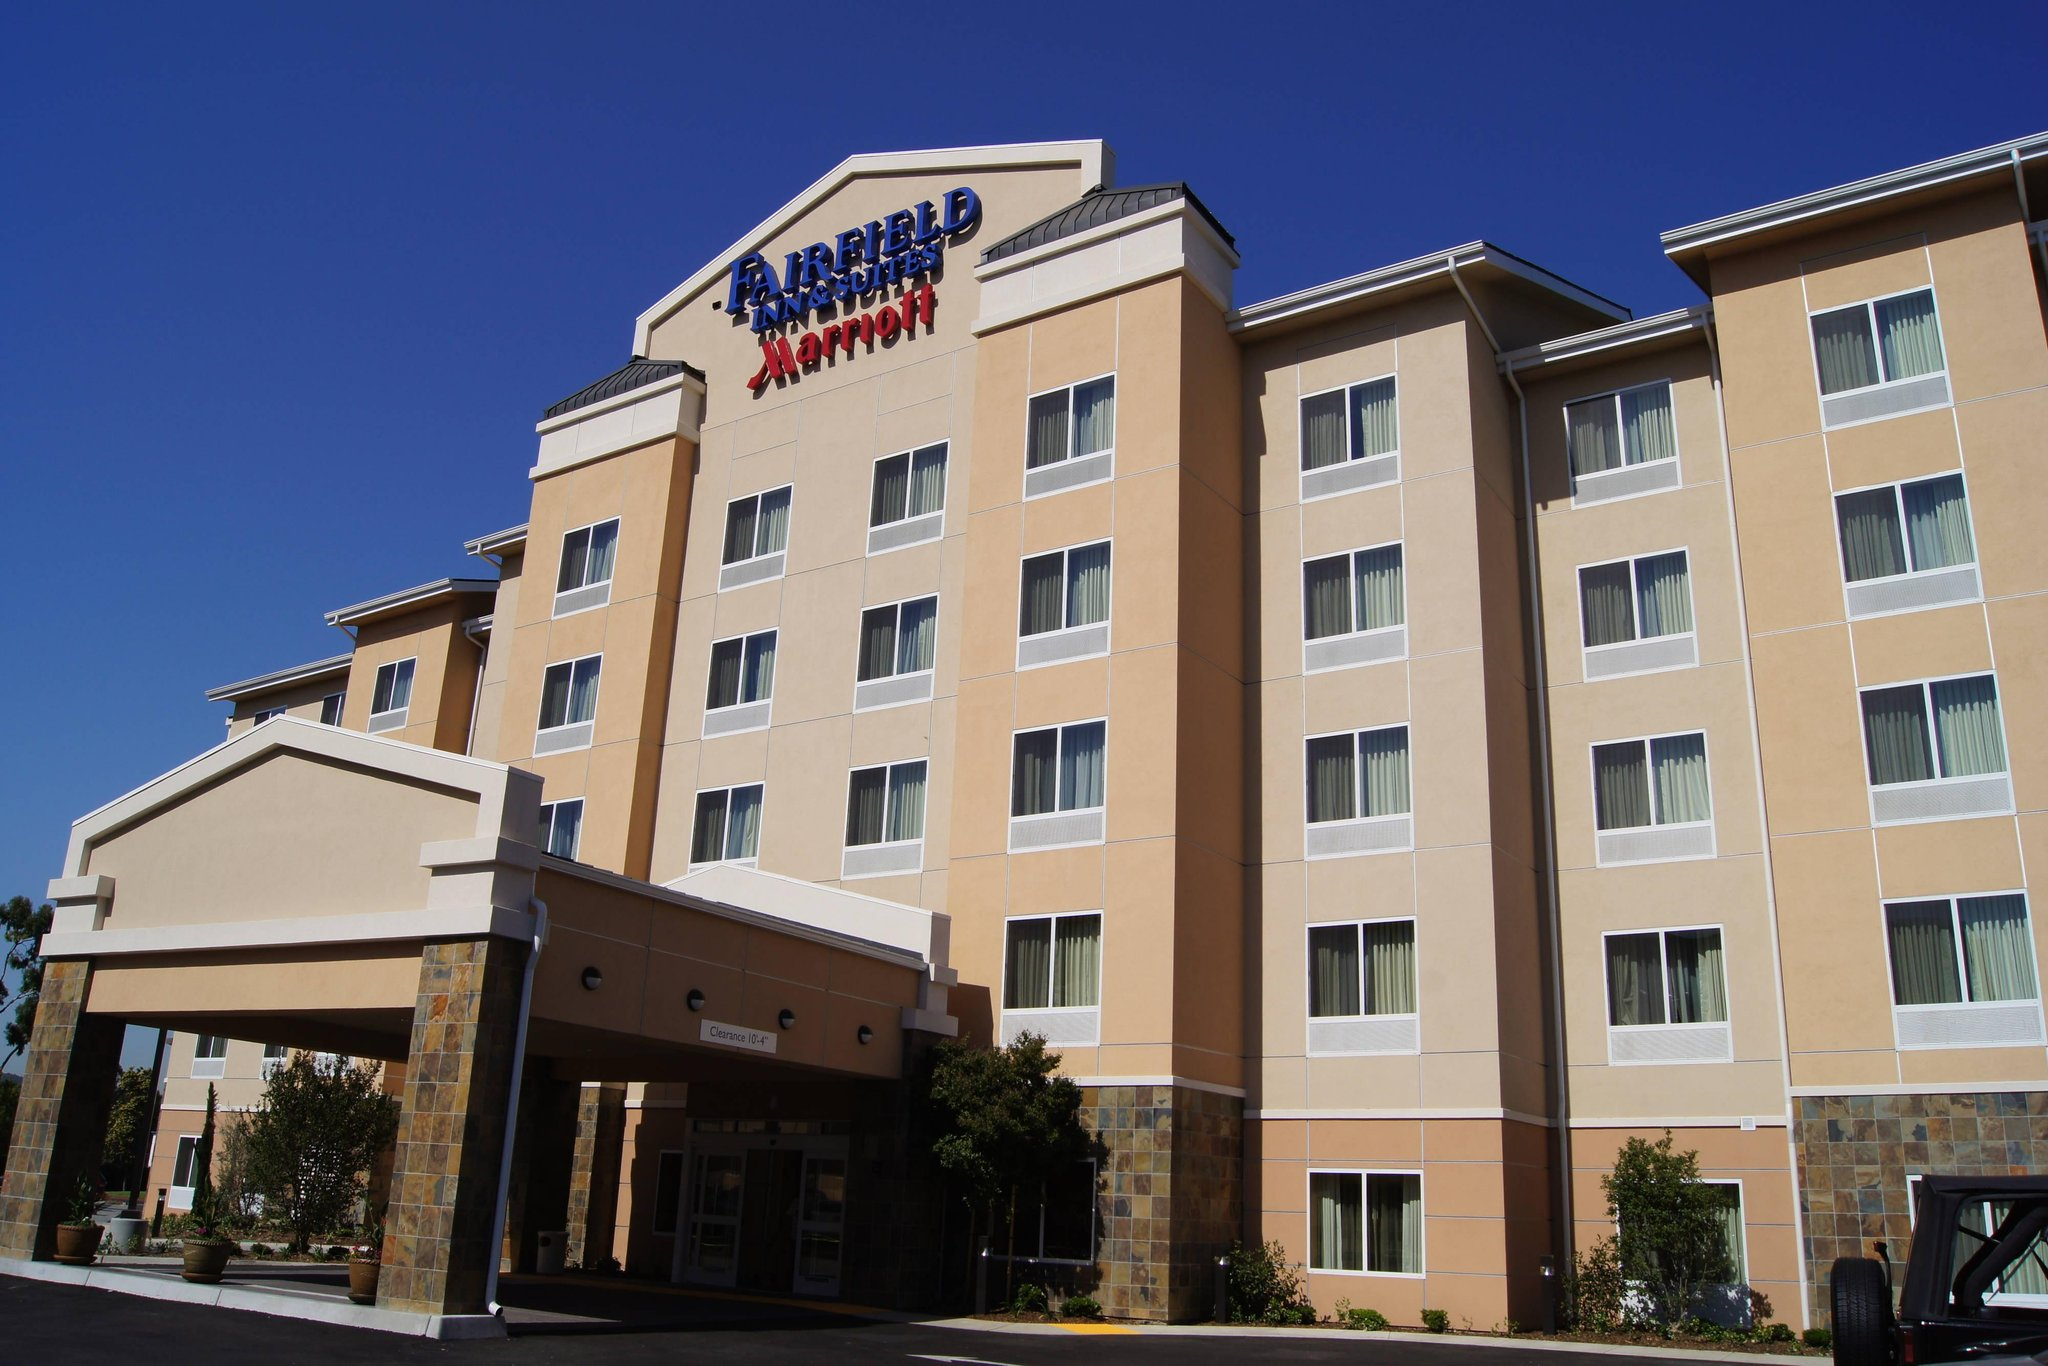 Fairfield Inn & Suites West Covina